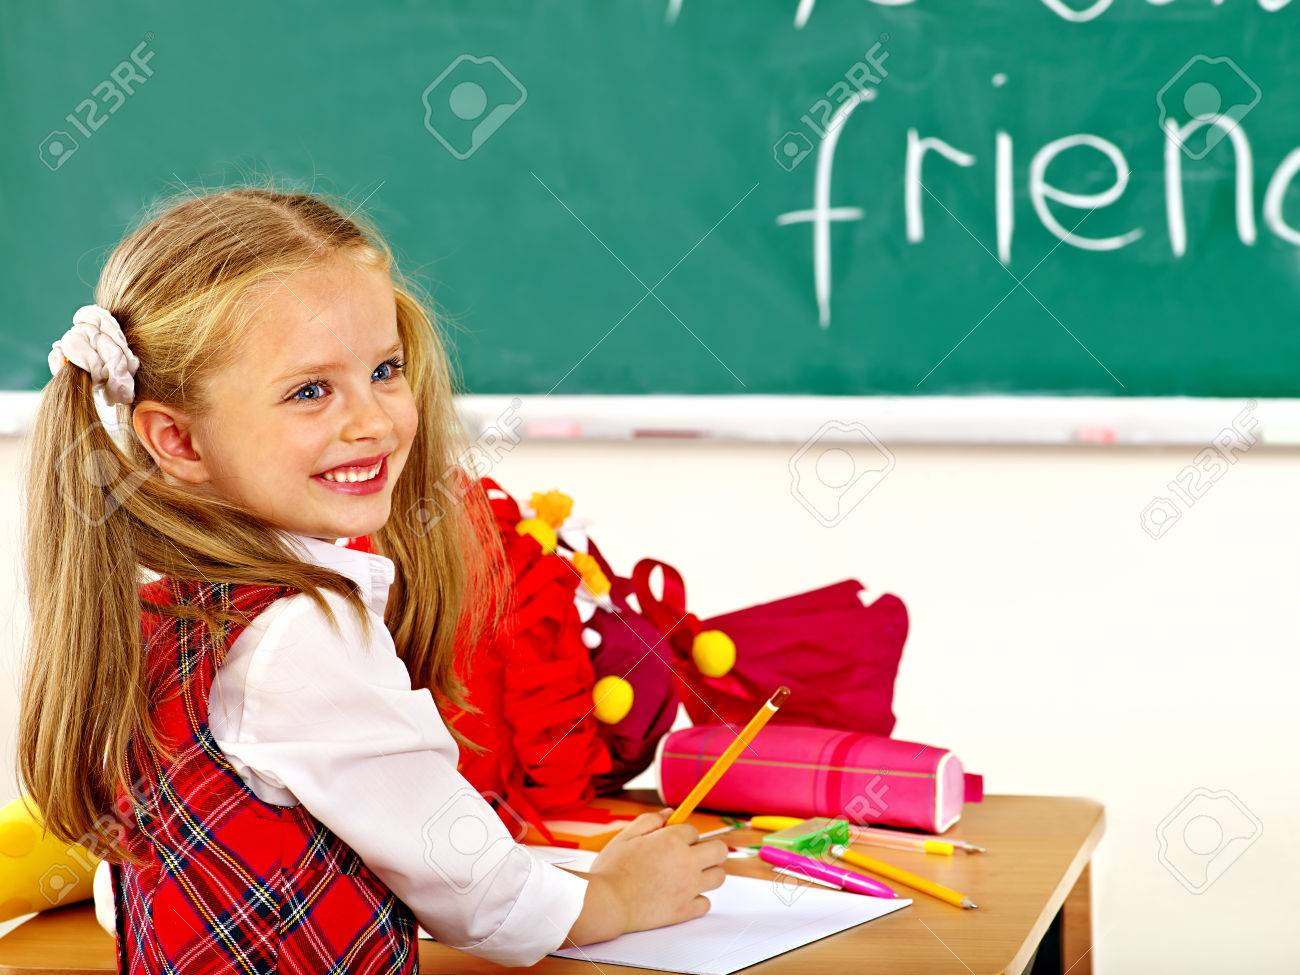 Child holding school cone in classroom. - 30839440